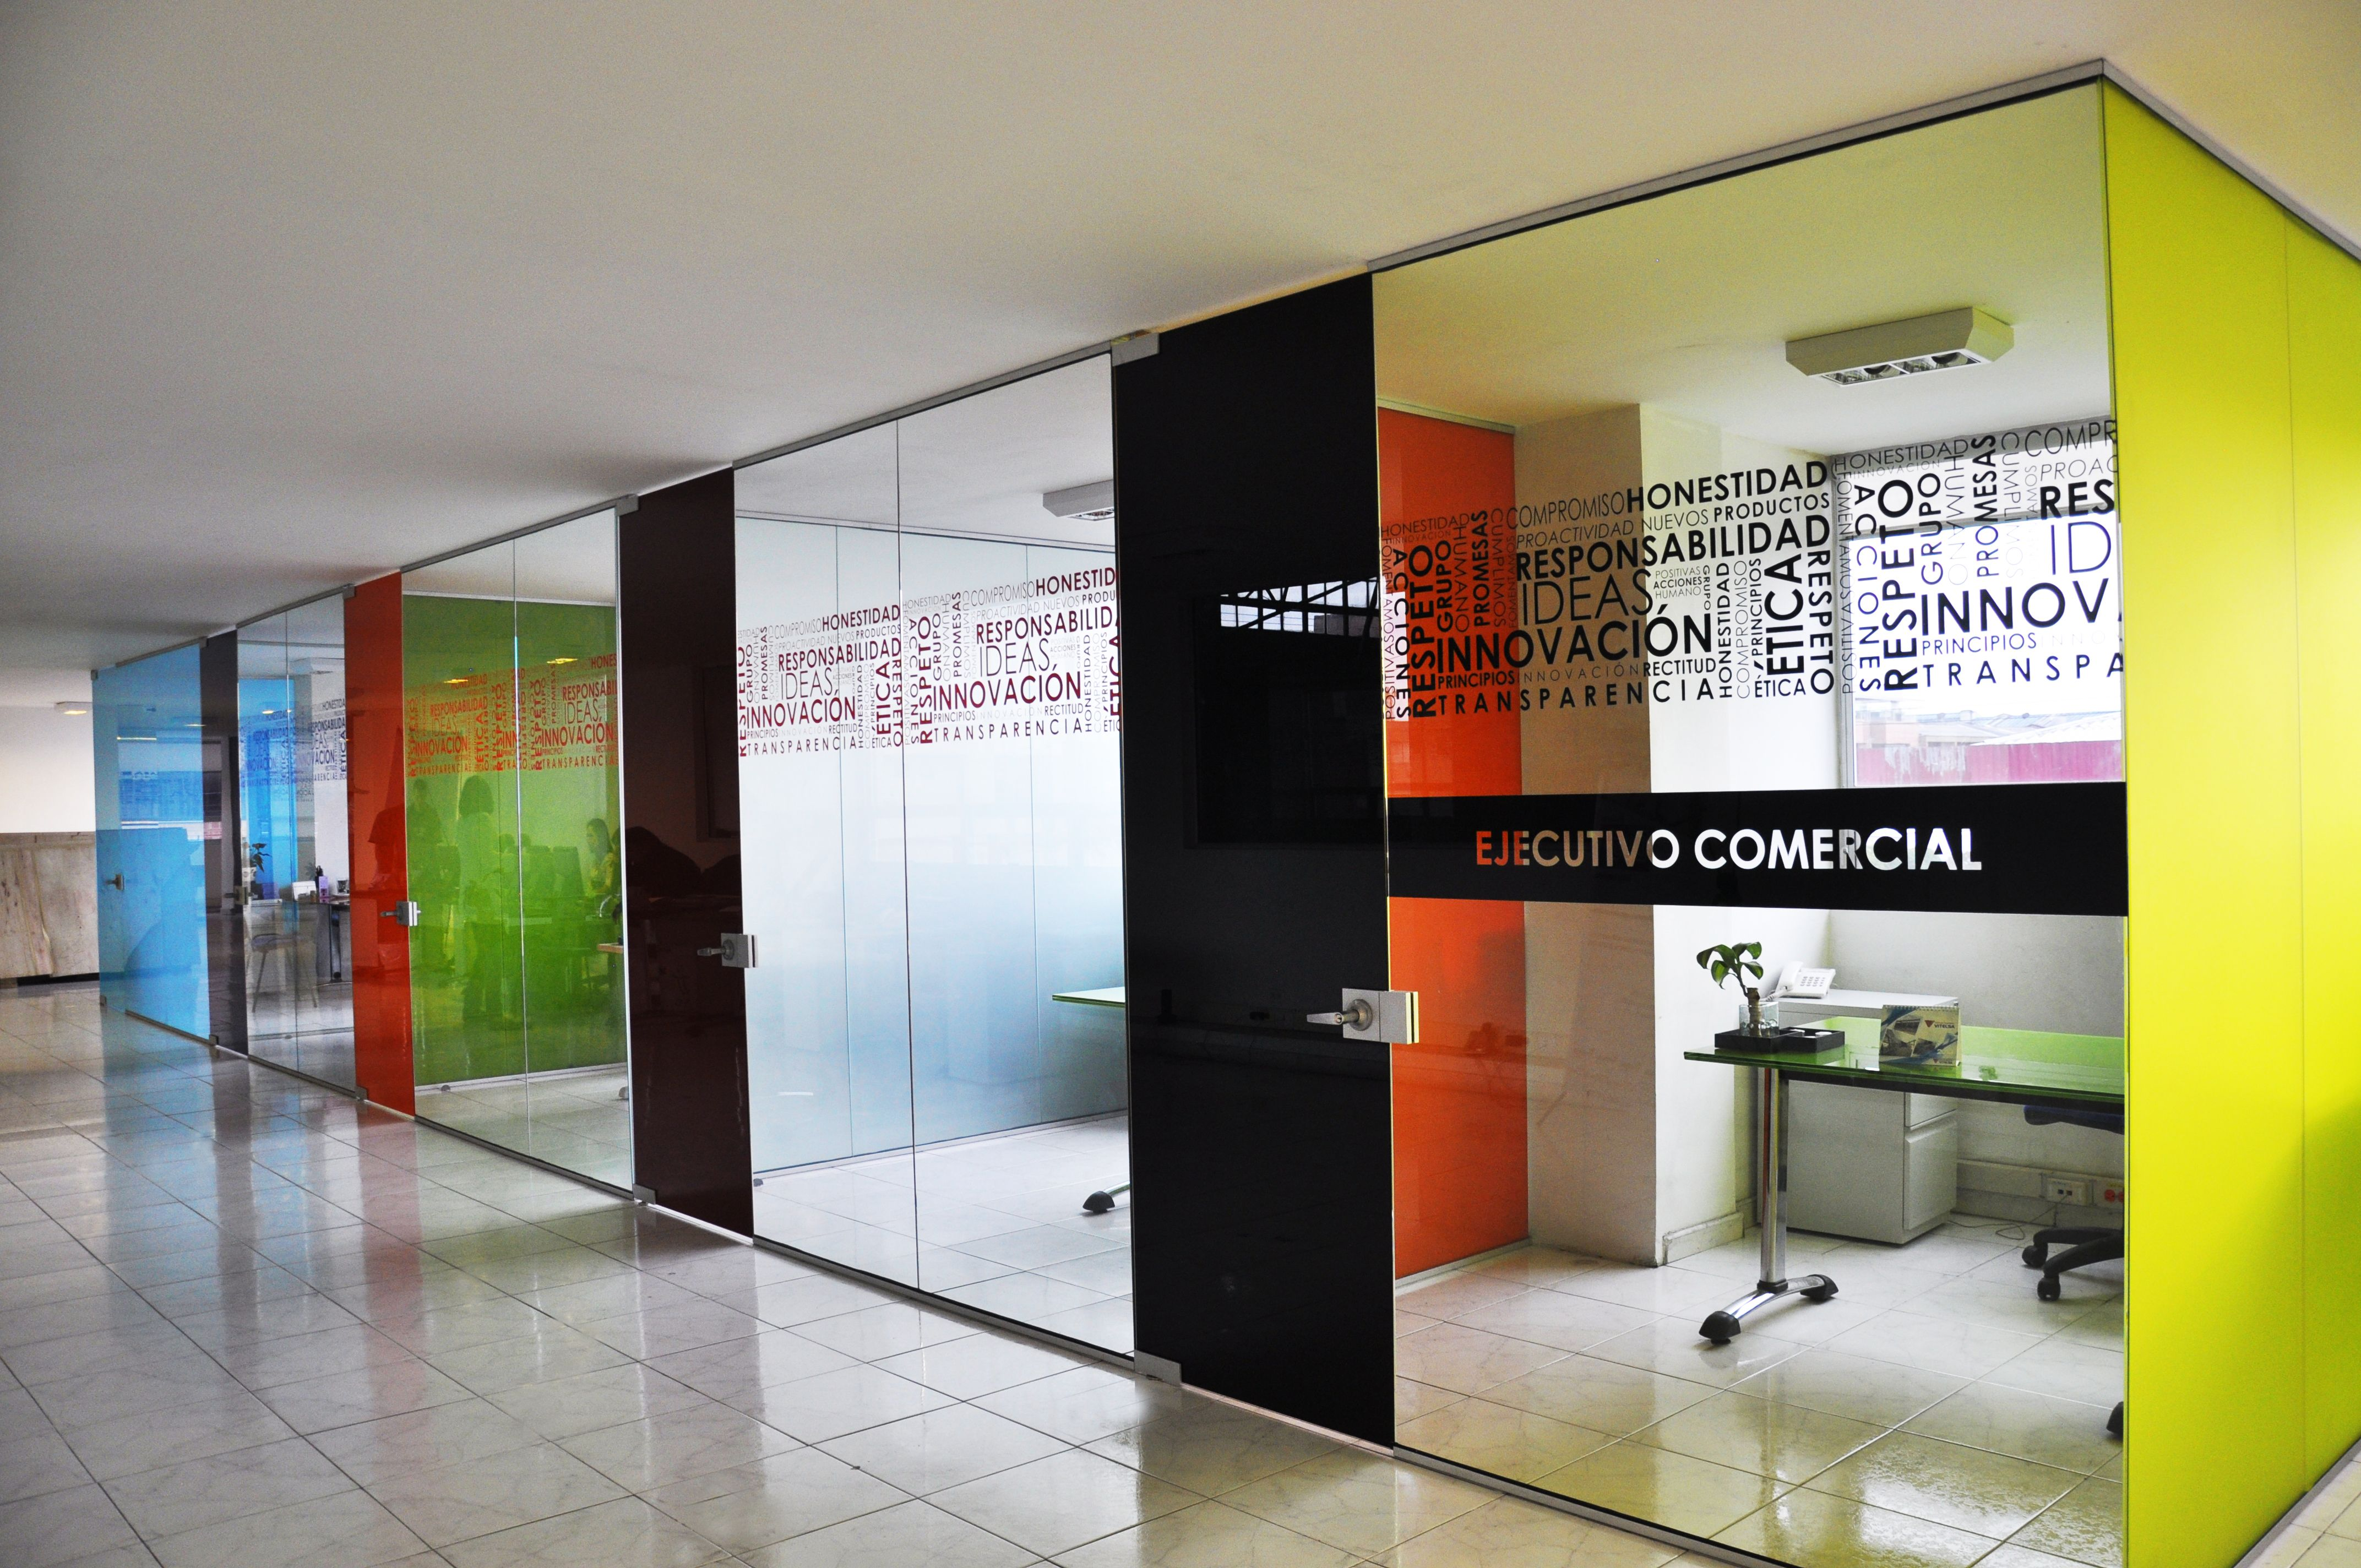 Divisiones de oficina piso techo o media altura con vidrios templados o ploteos pinterest for Divisiones de oficina